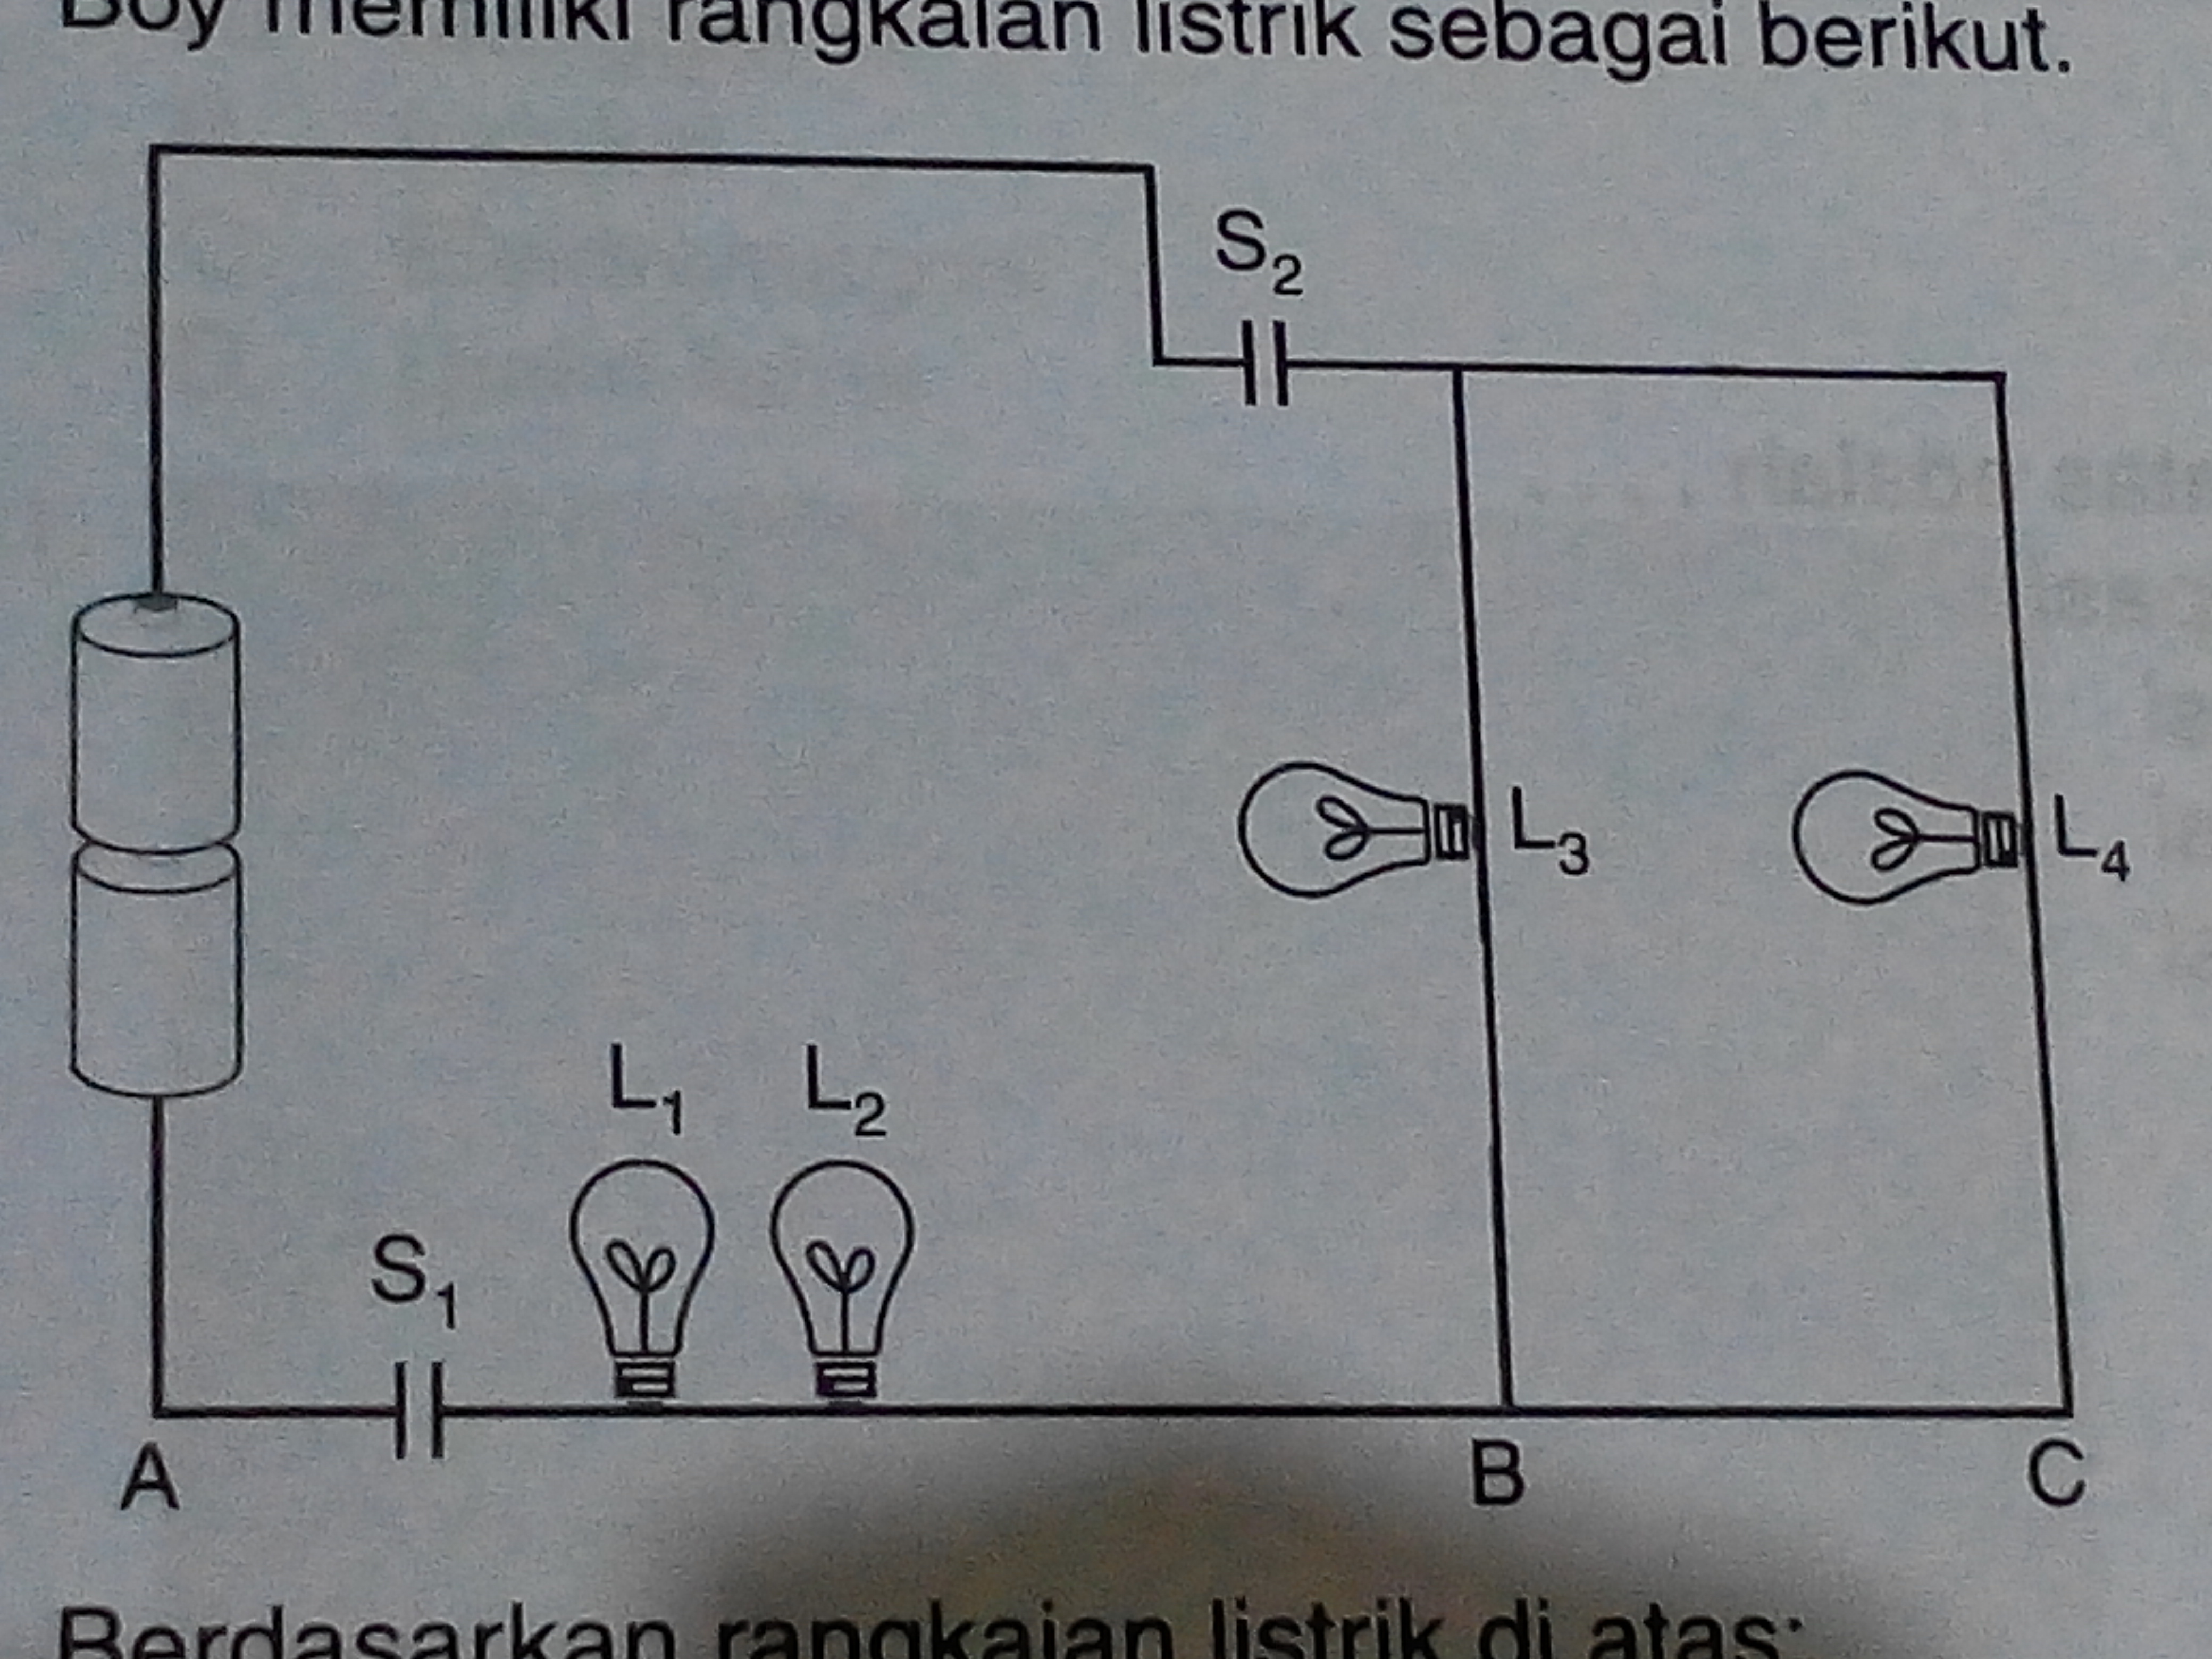 Boy memiliki rangkaian listrik sebagai berikut berdasarkan berdasarkan rangkaian listrik diatas a bagaimana jika sakelar s diputus lampu manakah yang menyala b apa jenis rangkaian pada titik ab dan bc ccuart Gallery